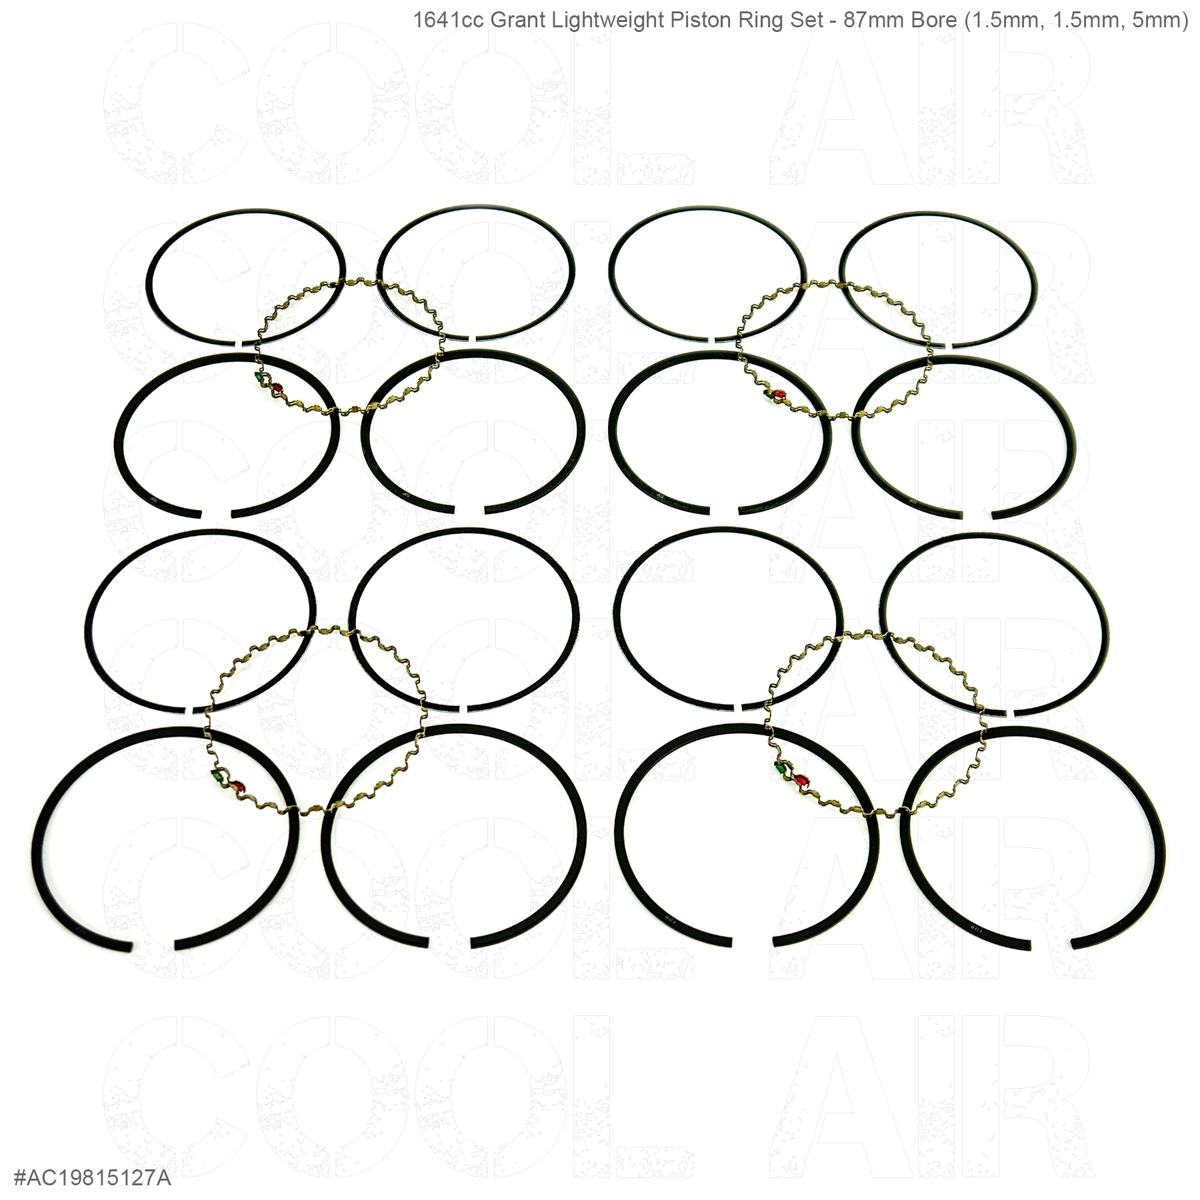 1641cc Grant Lightweight Piston Ring Set - 87mm Bore (1.5mm, 1.5mm, 5mm)